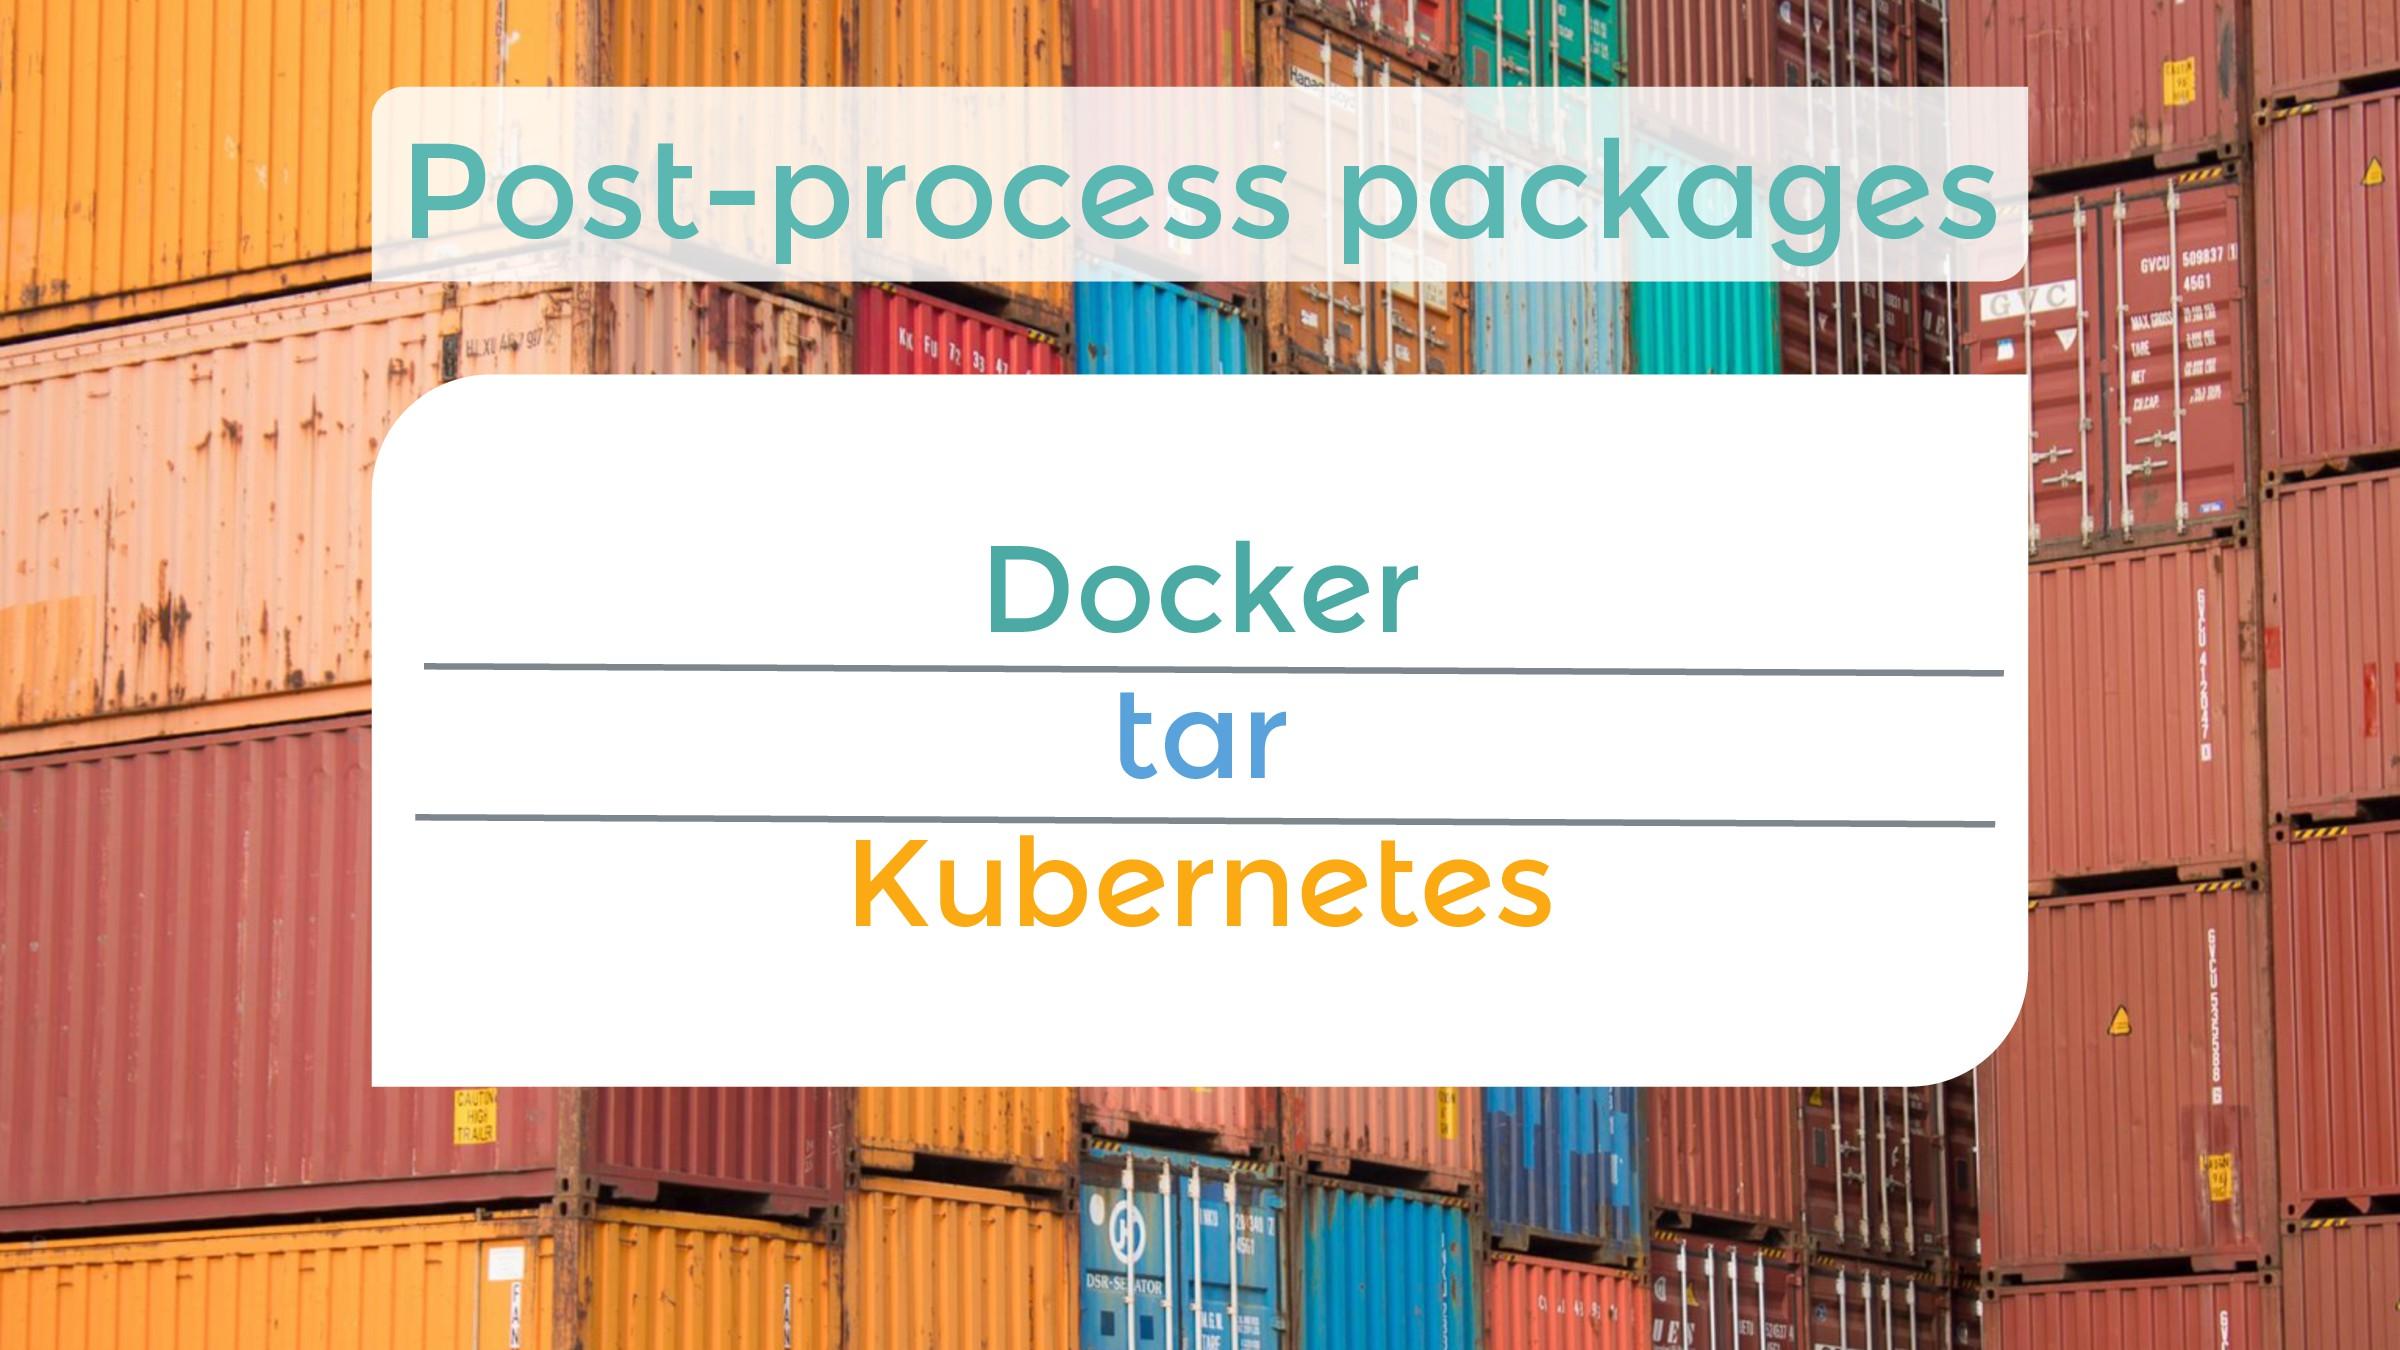 Docker tar Kubernetes Post-process packages